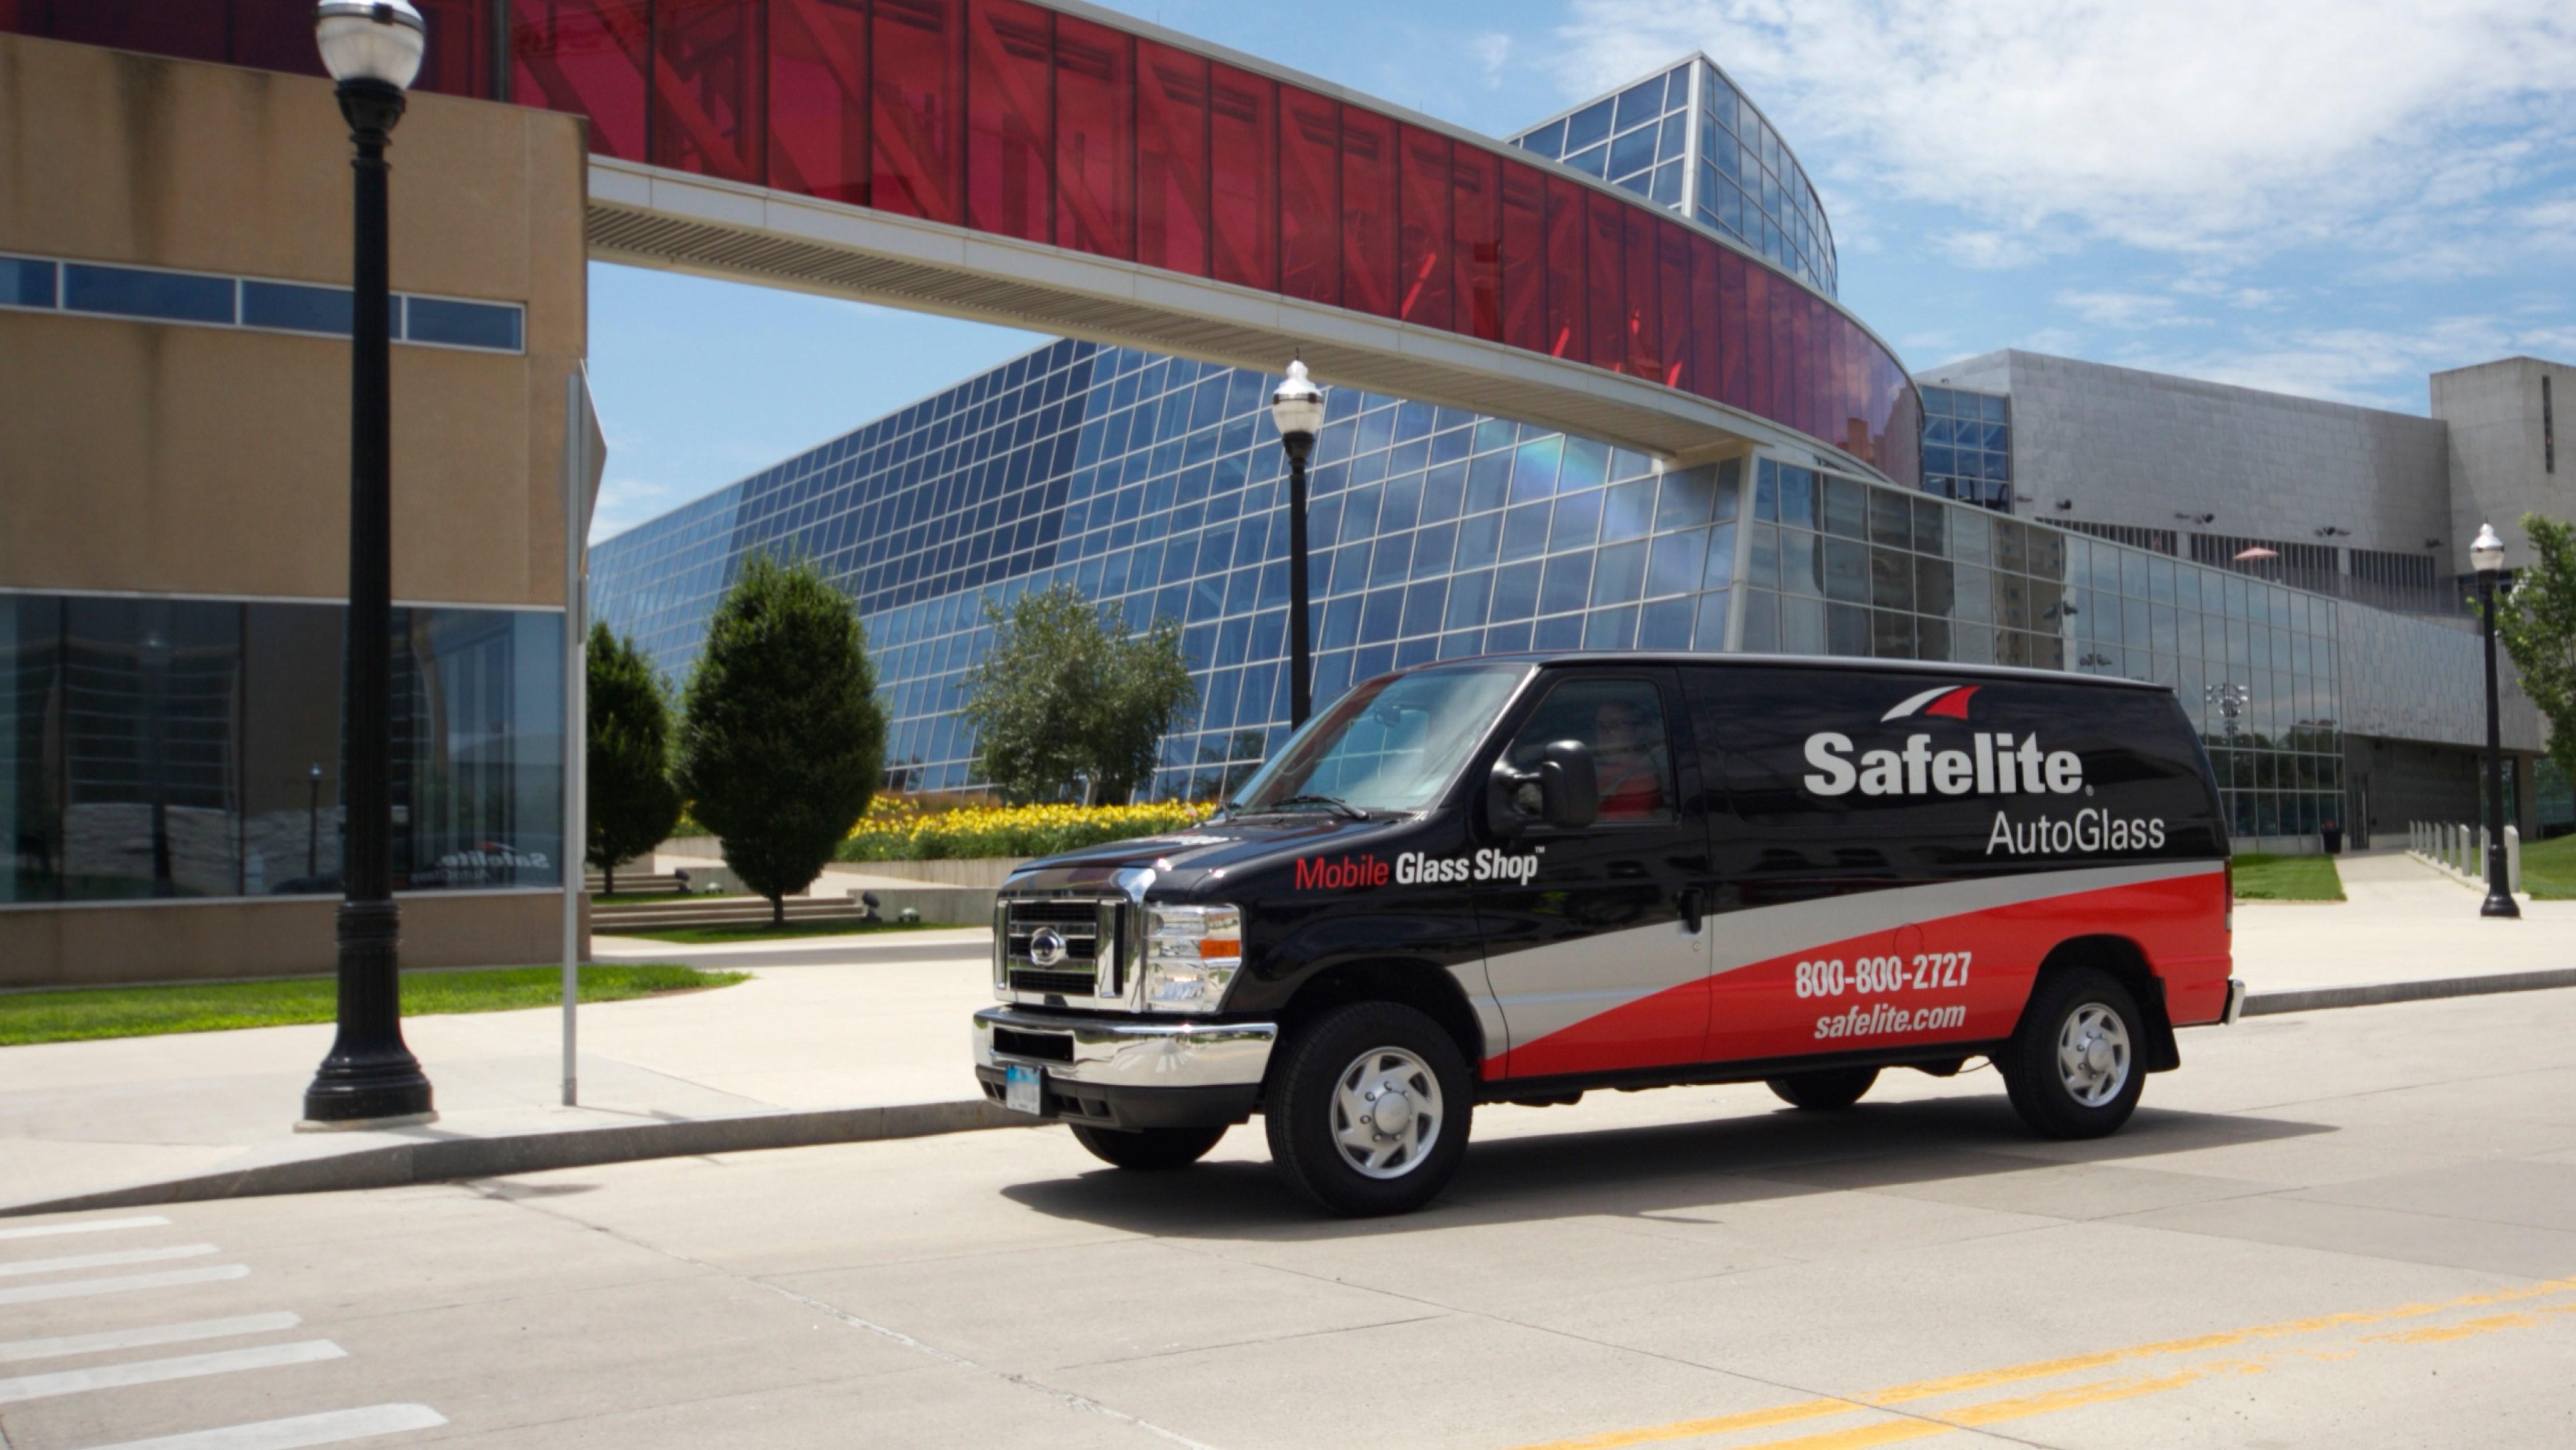 Safelite AutoGlass  Baytown, TX 77520  Angie\u002639;s List